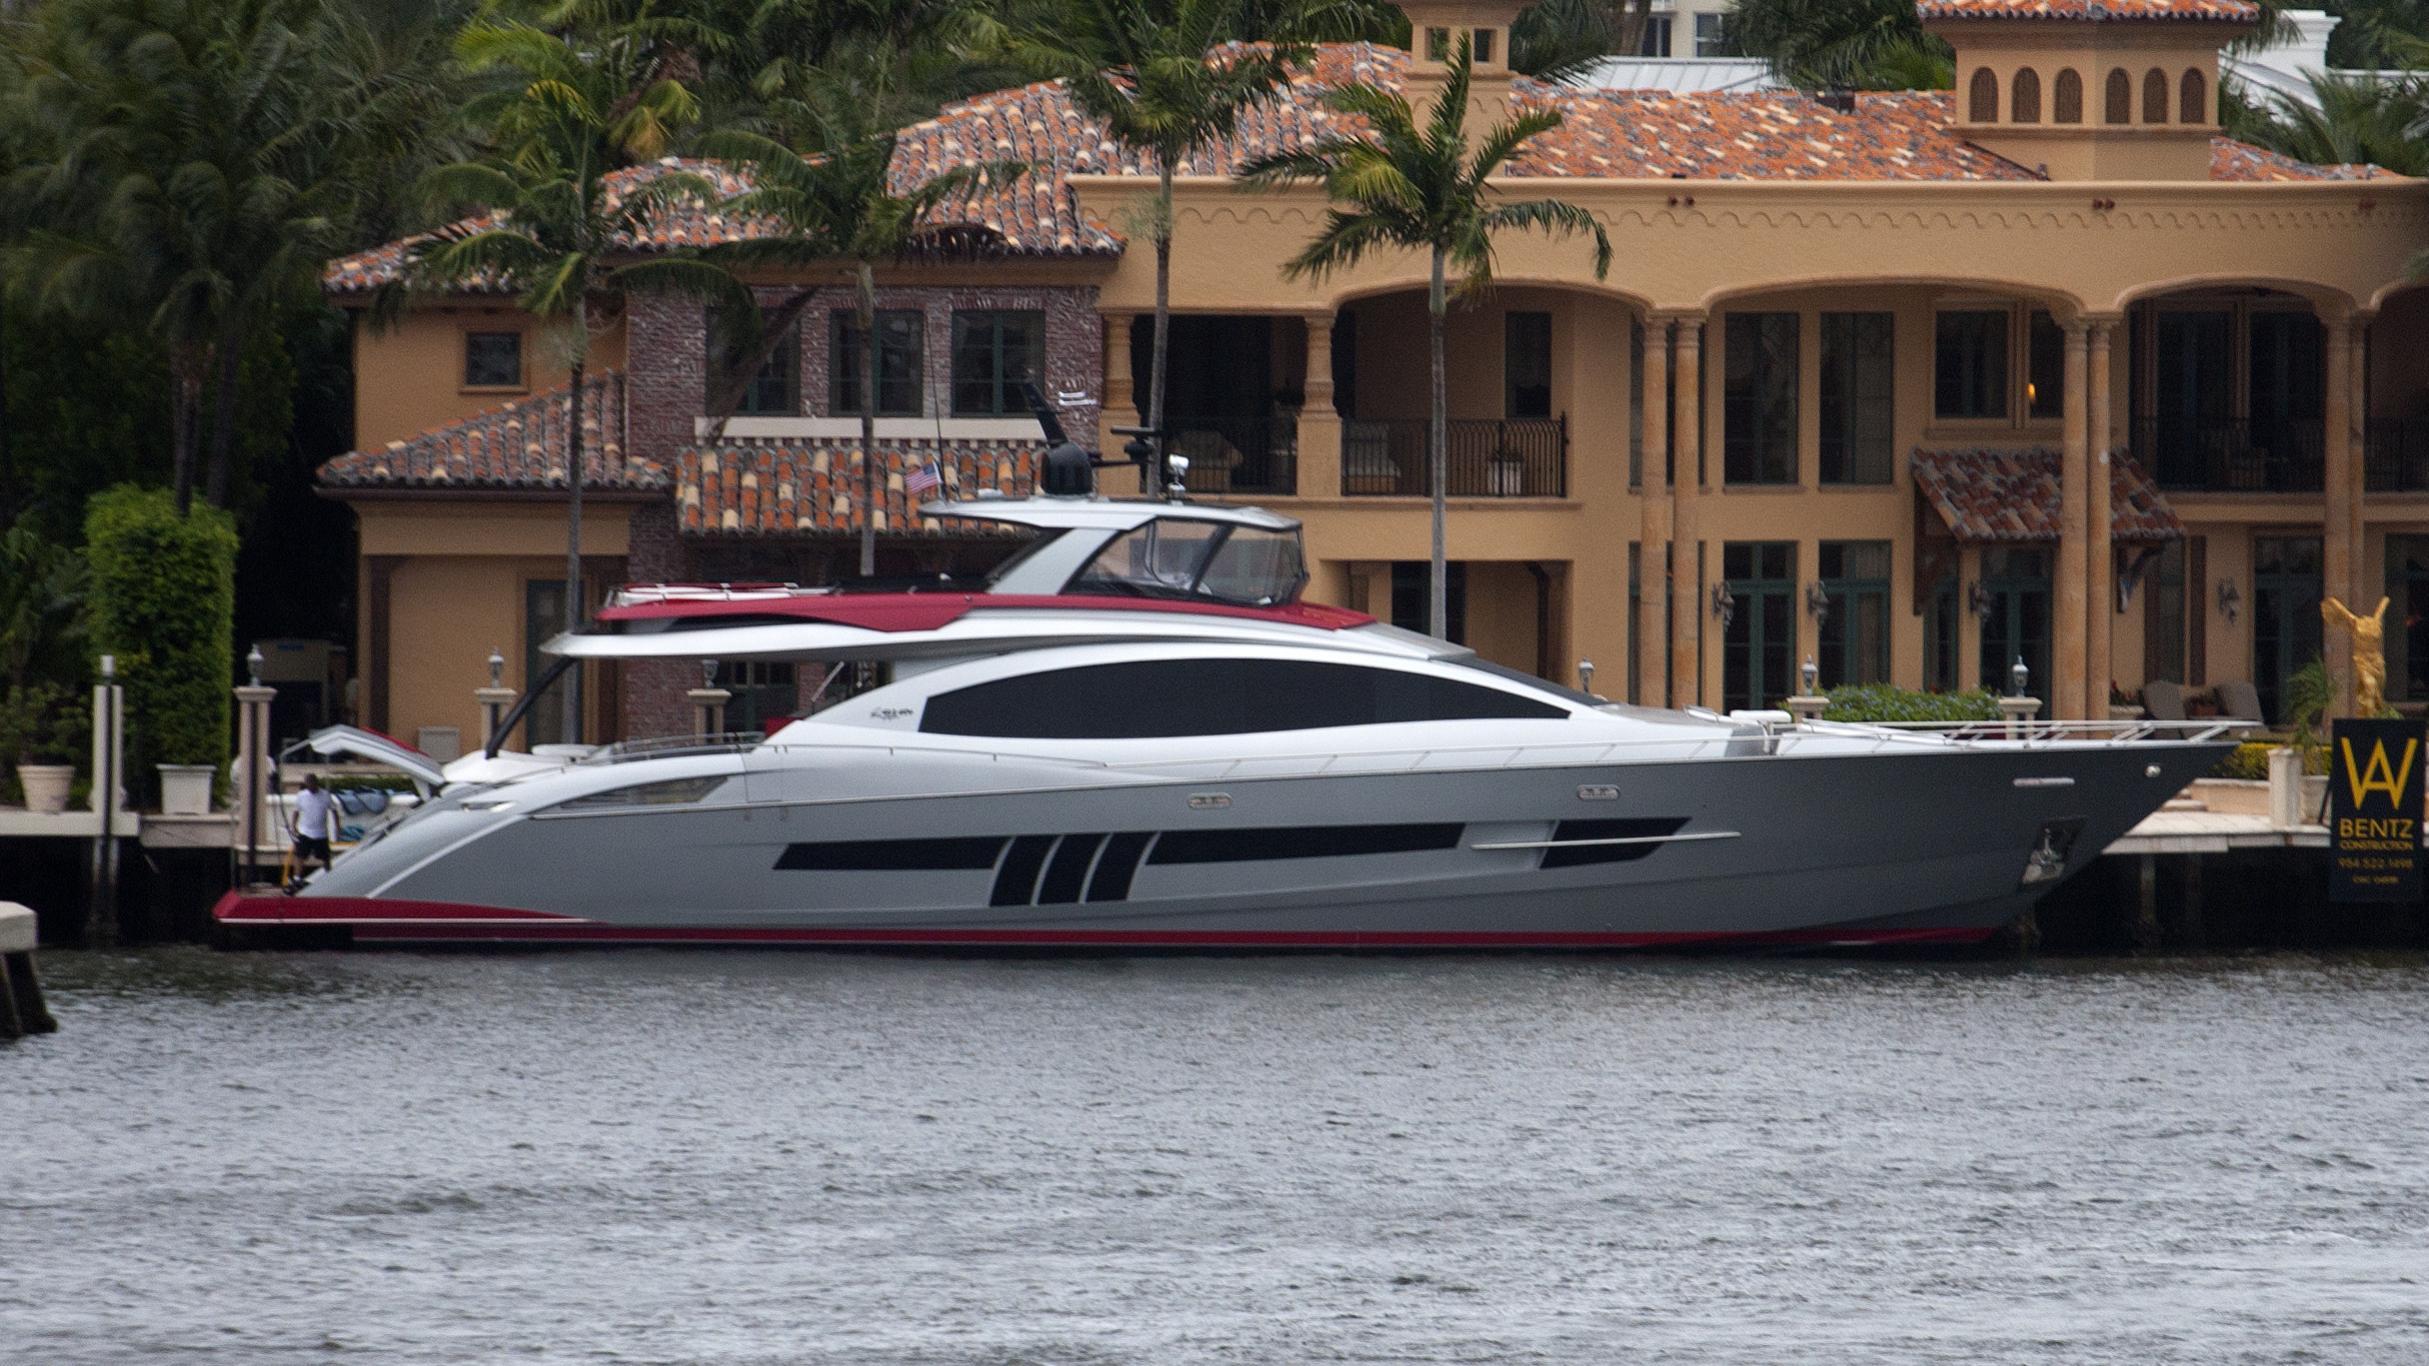 ashley virgin motoryacht lazzara 28m 2014 profile